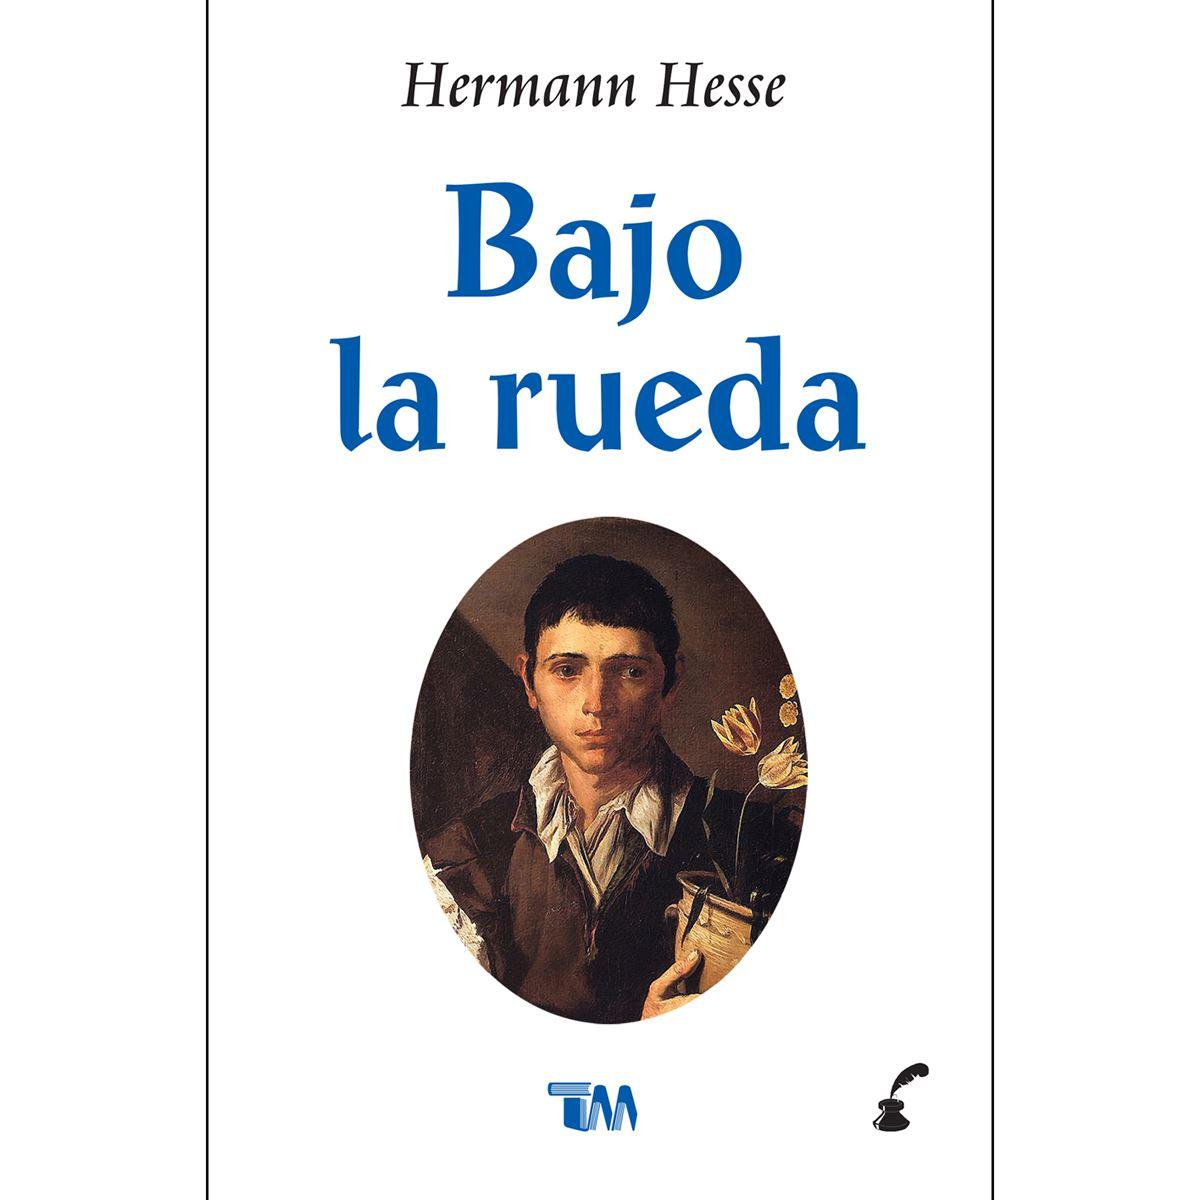 Hesse bajo la rueda Libro - Sanborns